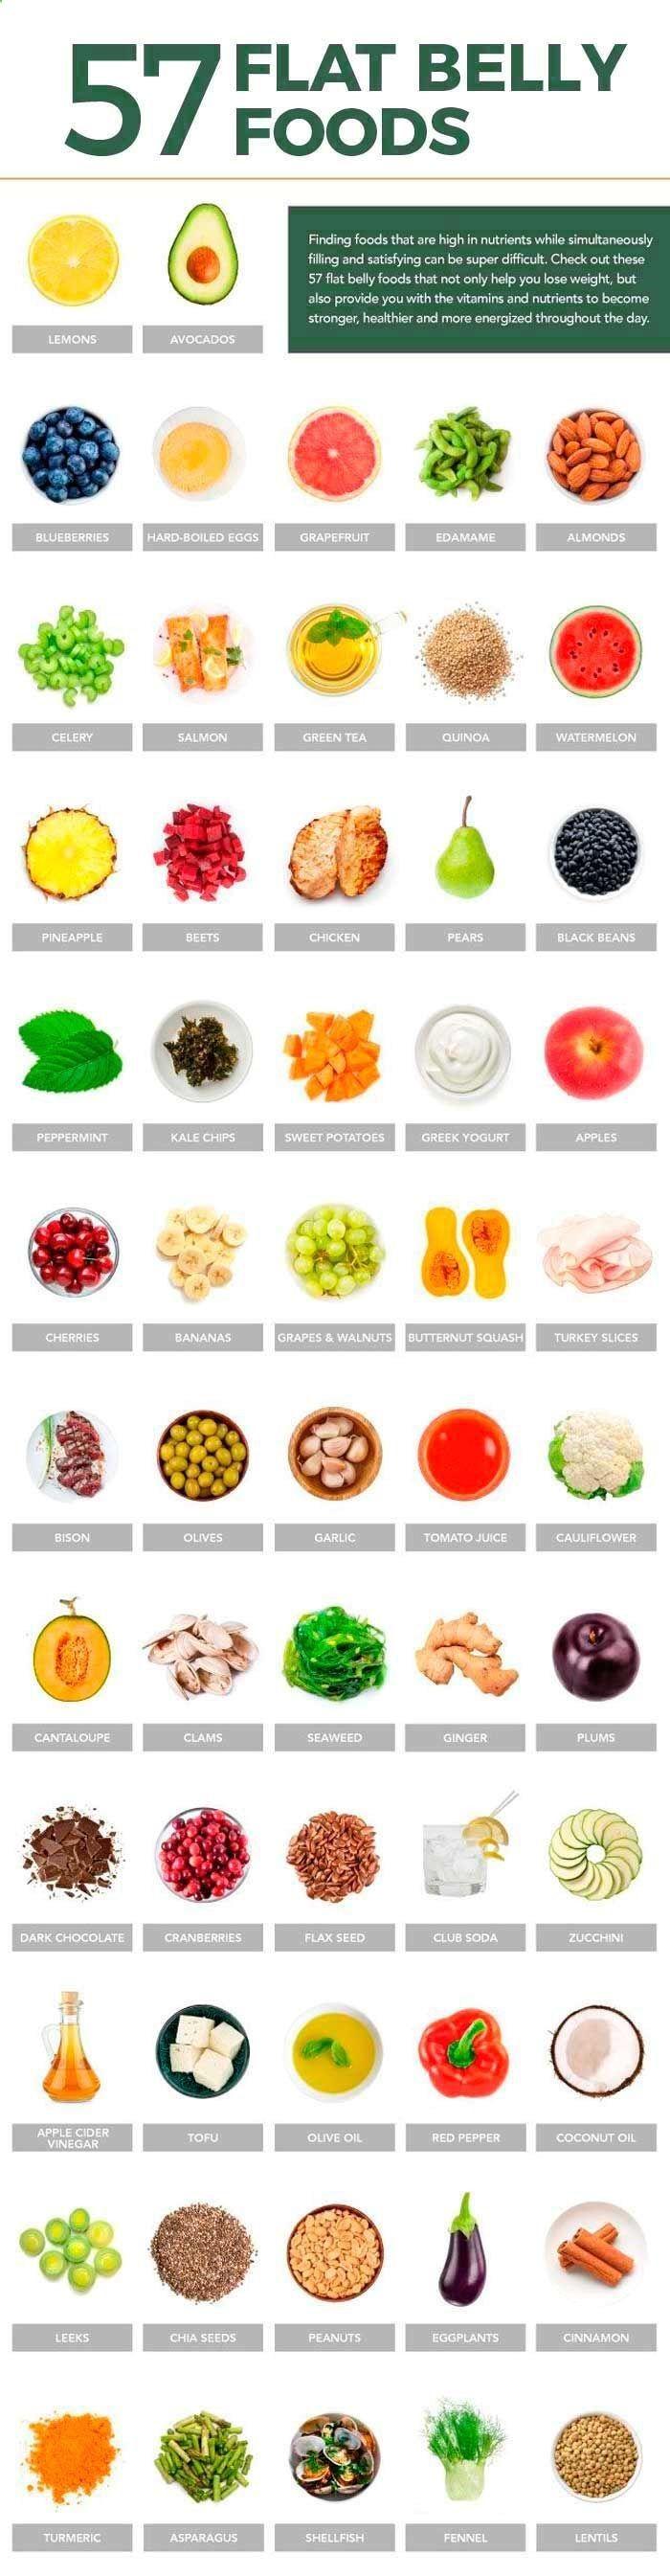 High fiber diet sample plan picture 6